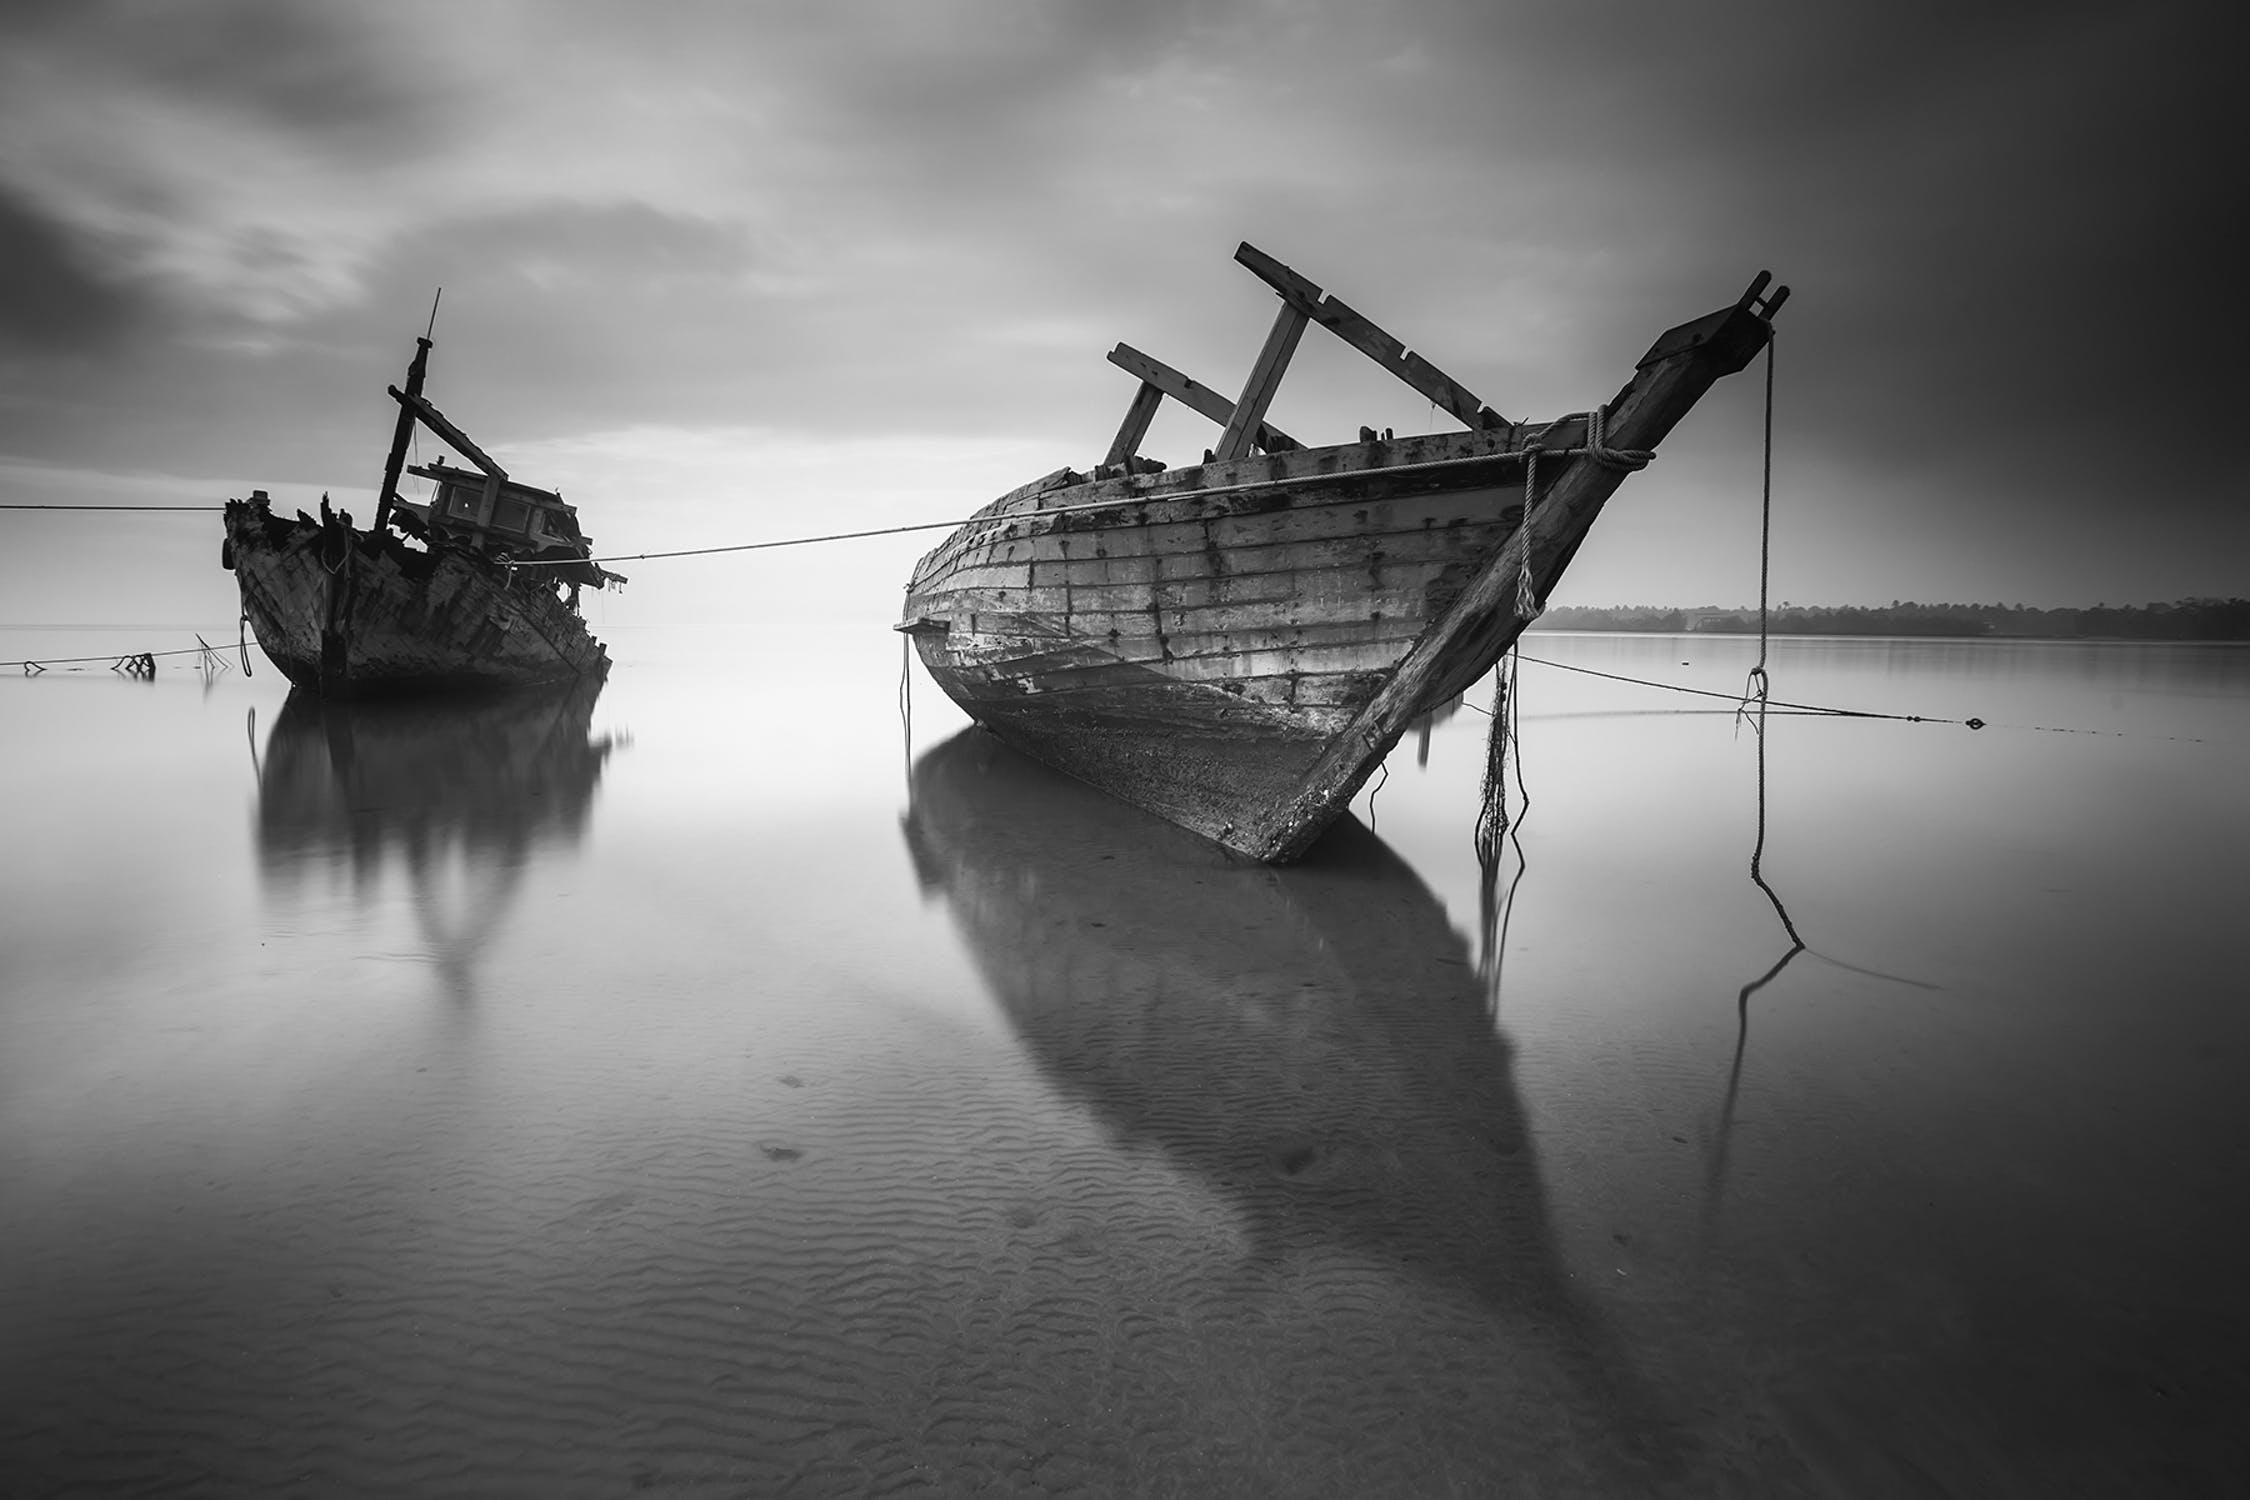 Shipwrecks in the Bahamas